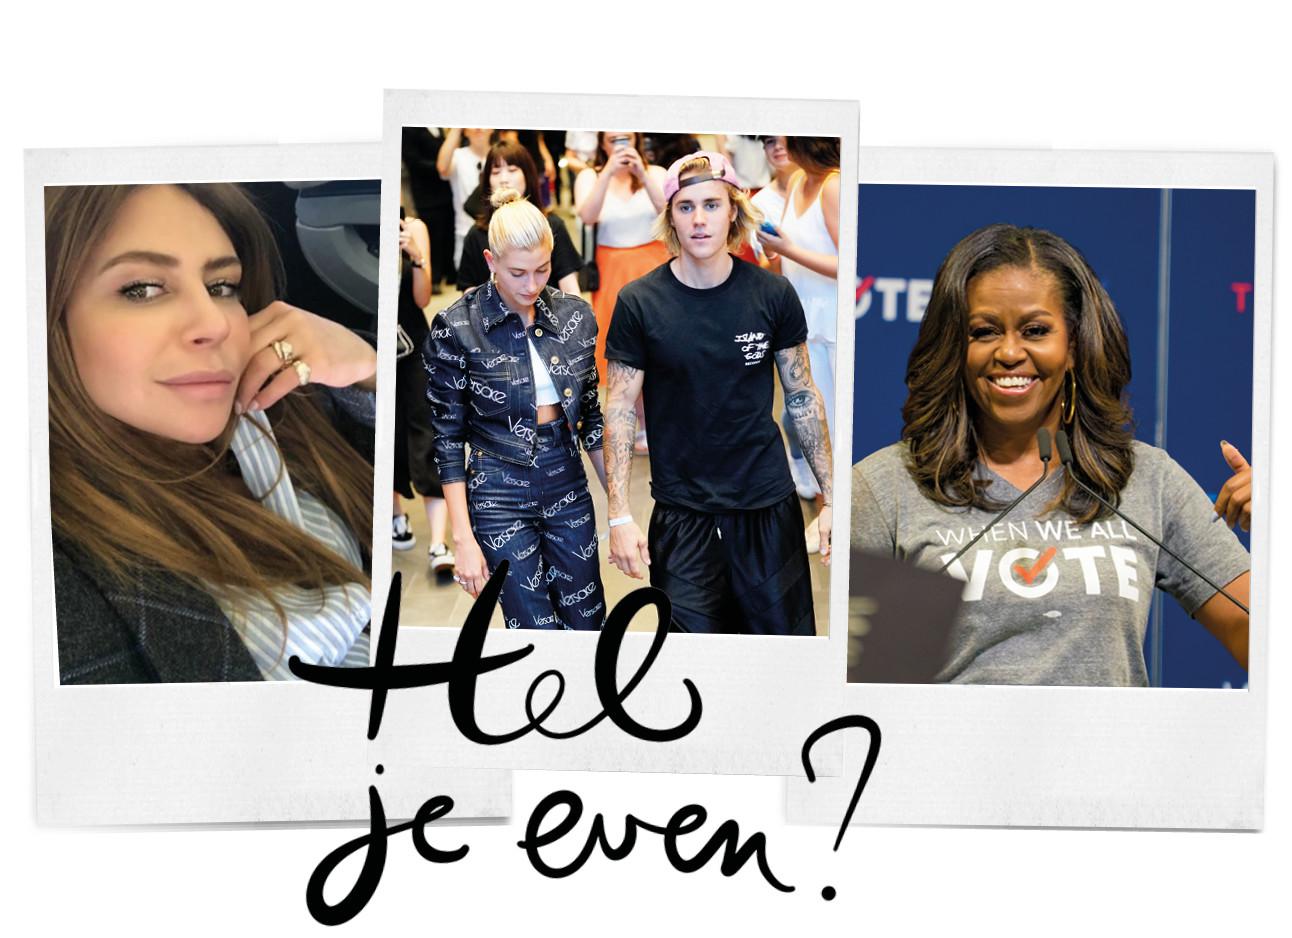 trending topic in polaroids olcay gulsen presentatrice, hailey en justin bieber en michelle obama